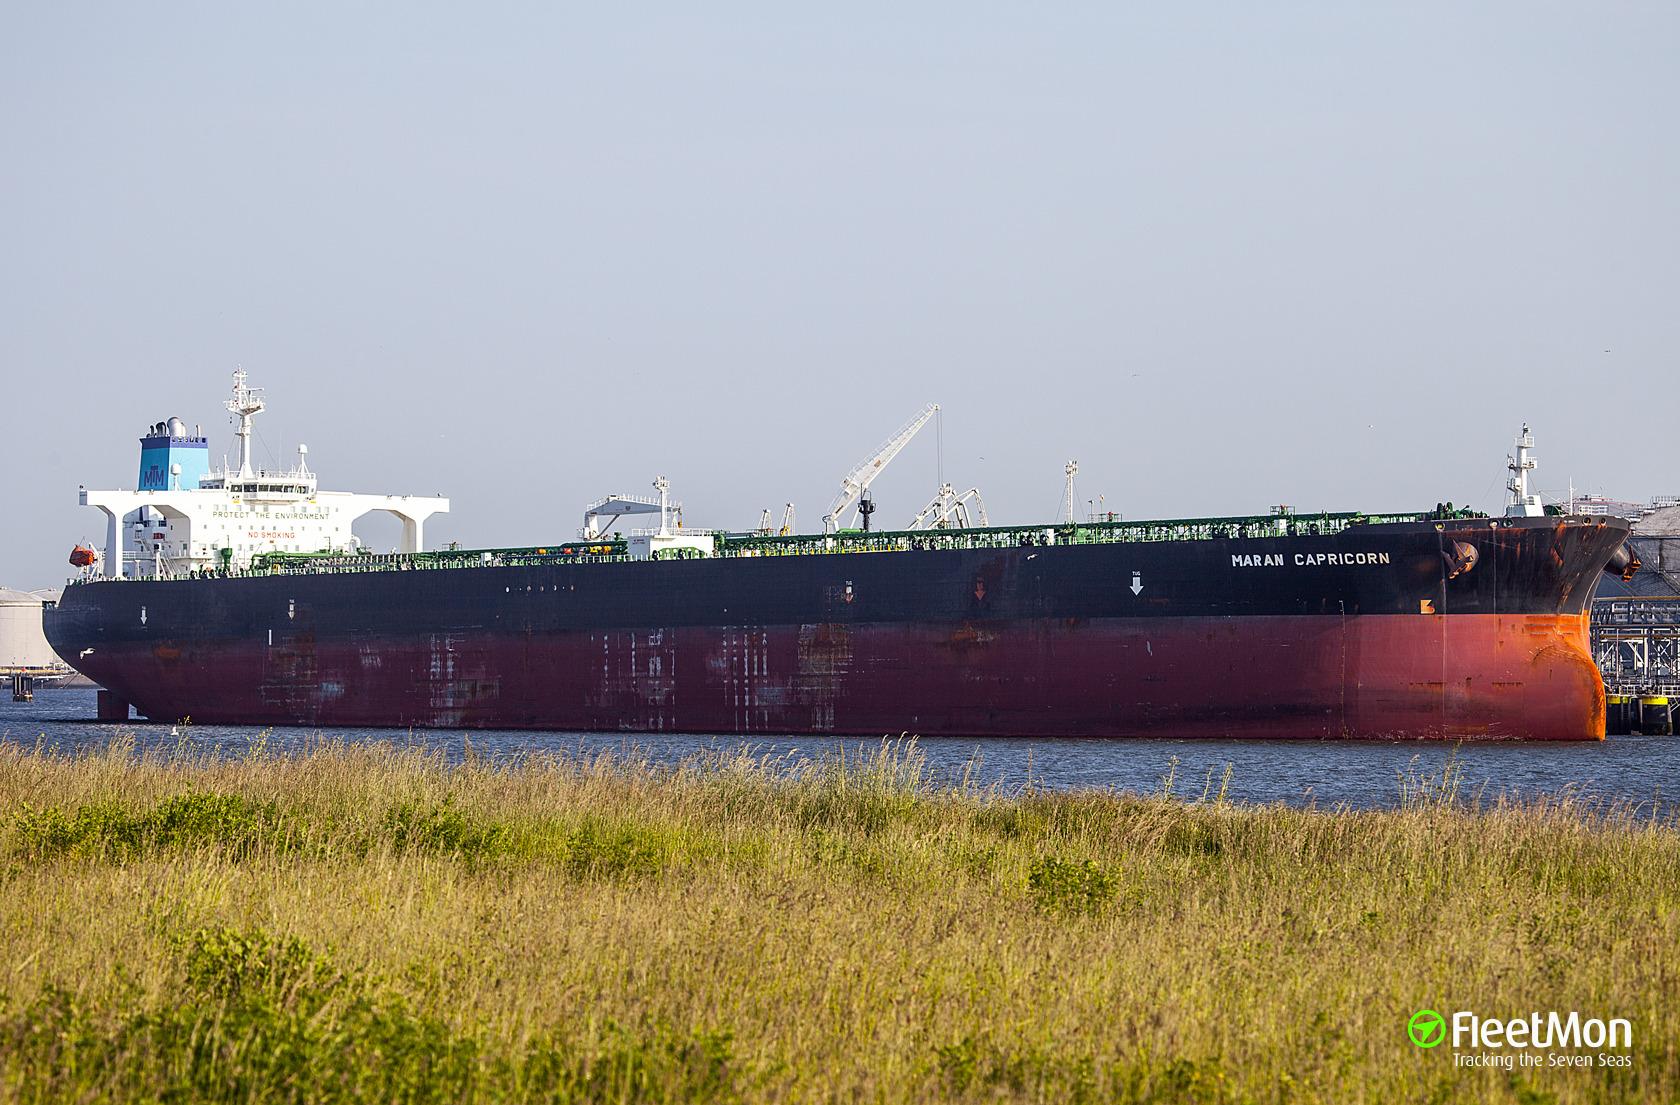 MARAN CAPRICORN (Oil tanker) IMO 9389019